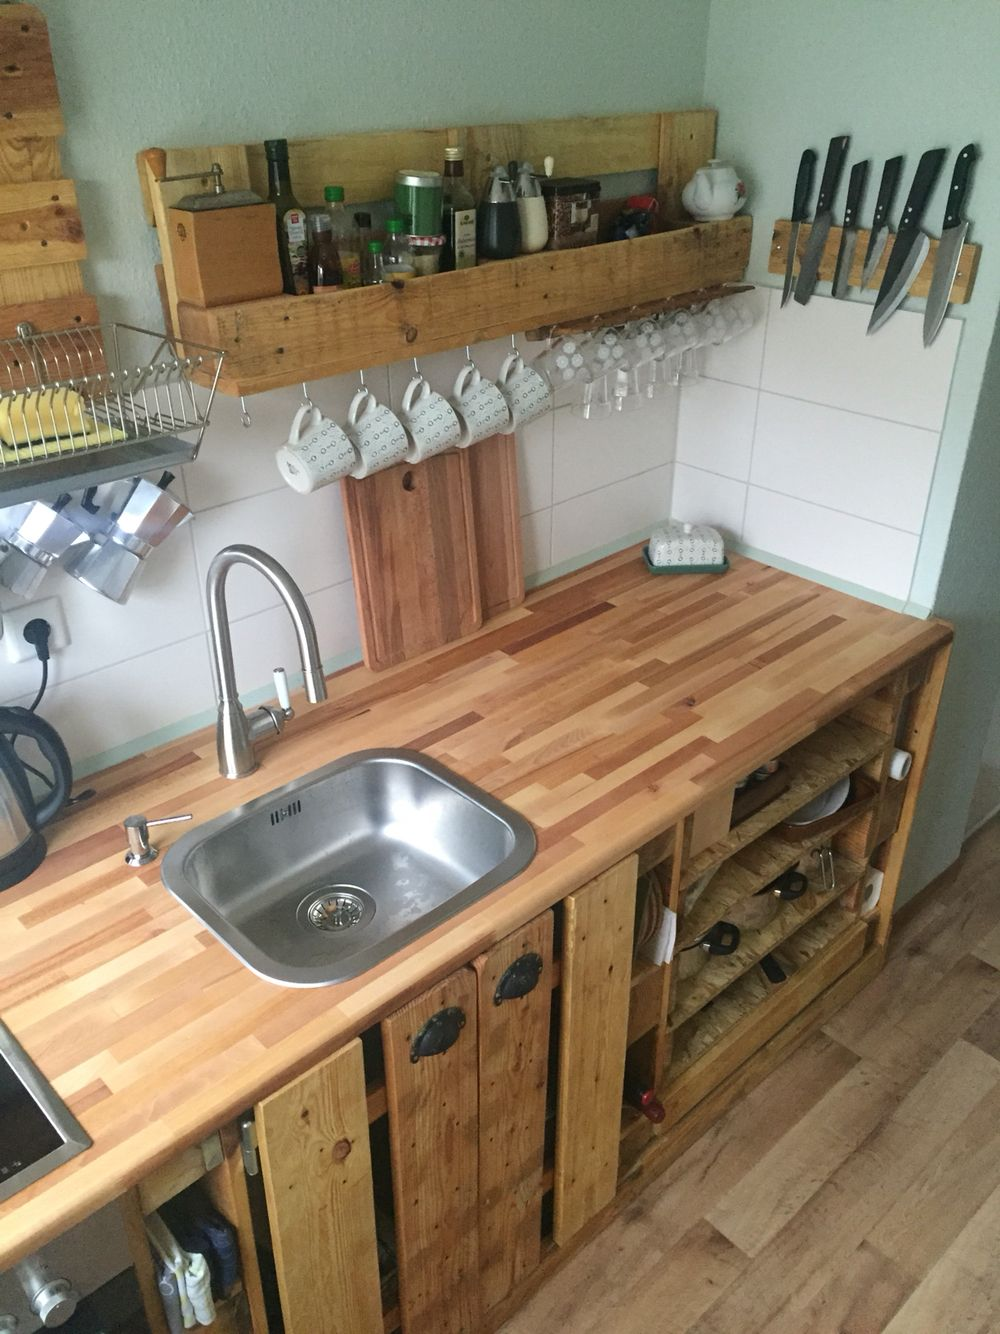 Harga Kitchen Set Jati Belanda 1 4 Jt M3 Wa 0819 2713 3247 Jati